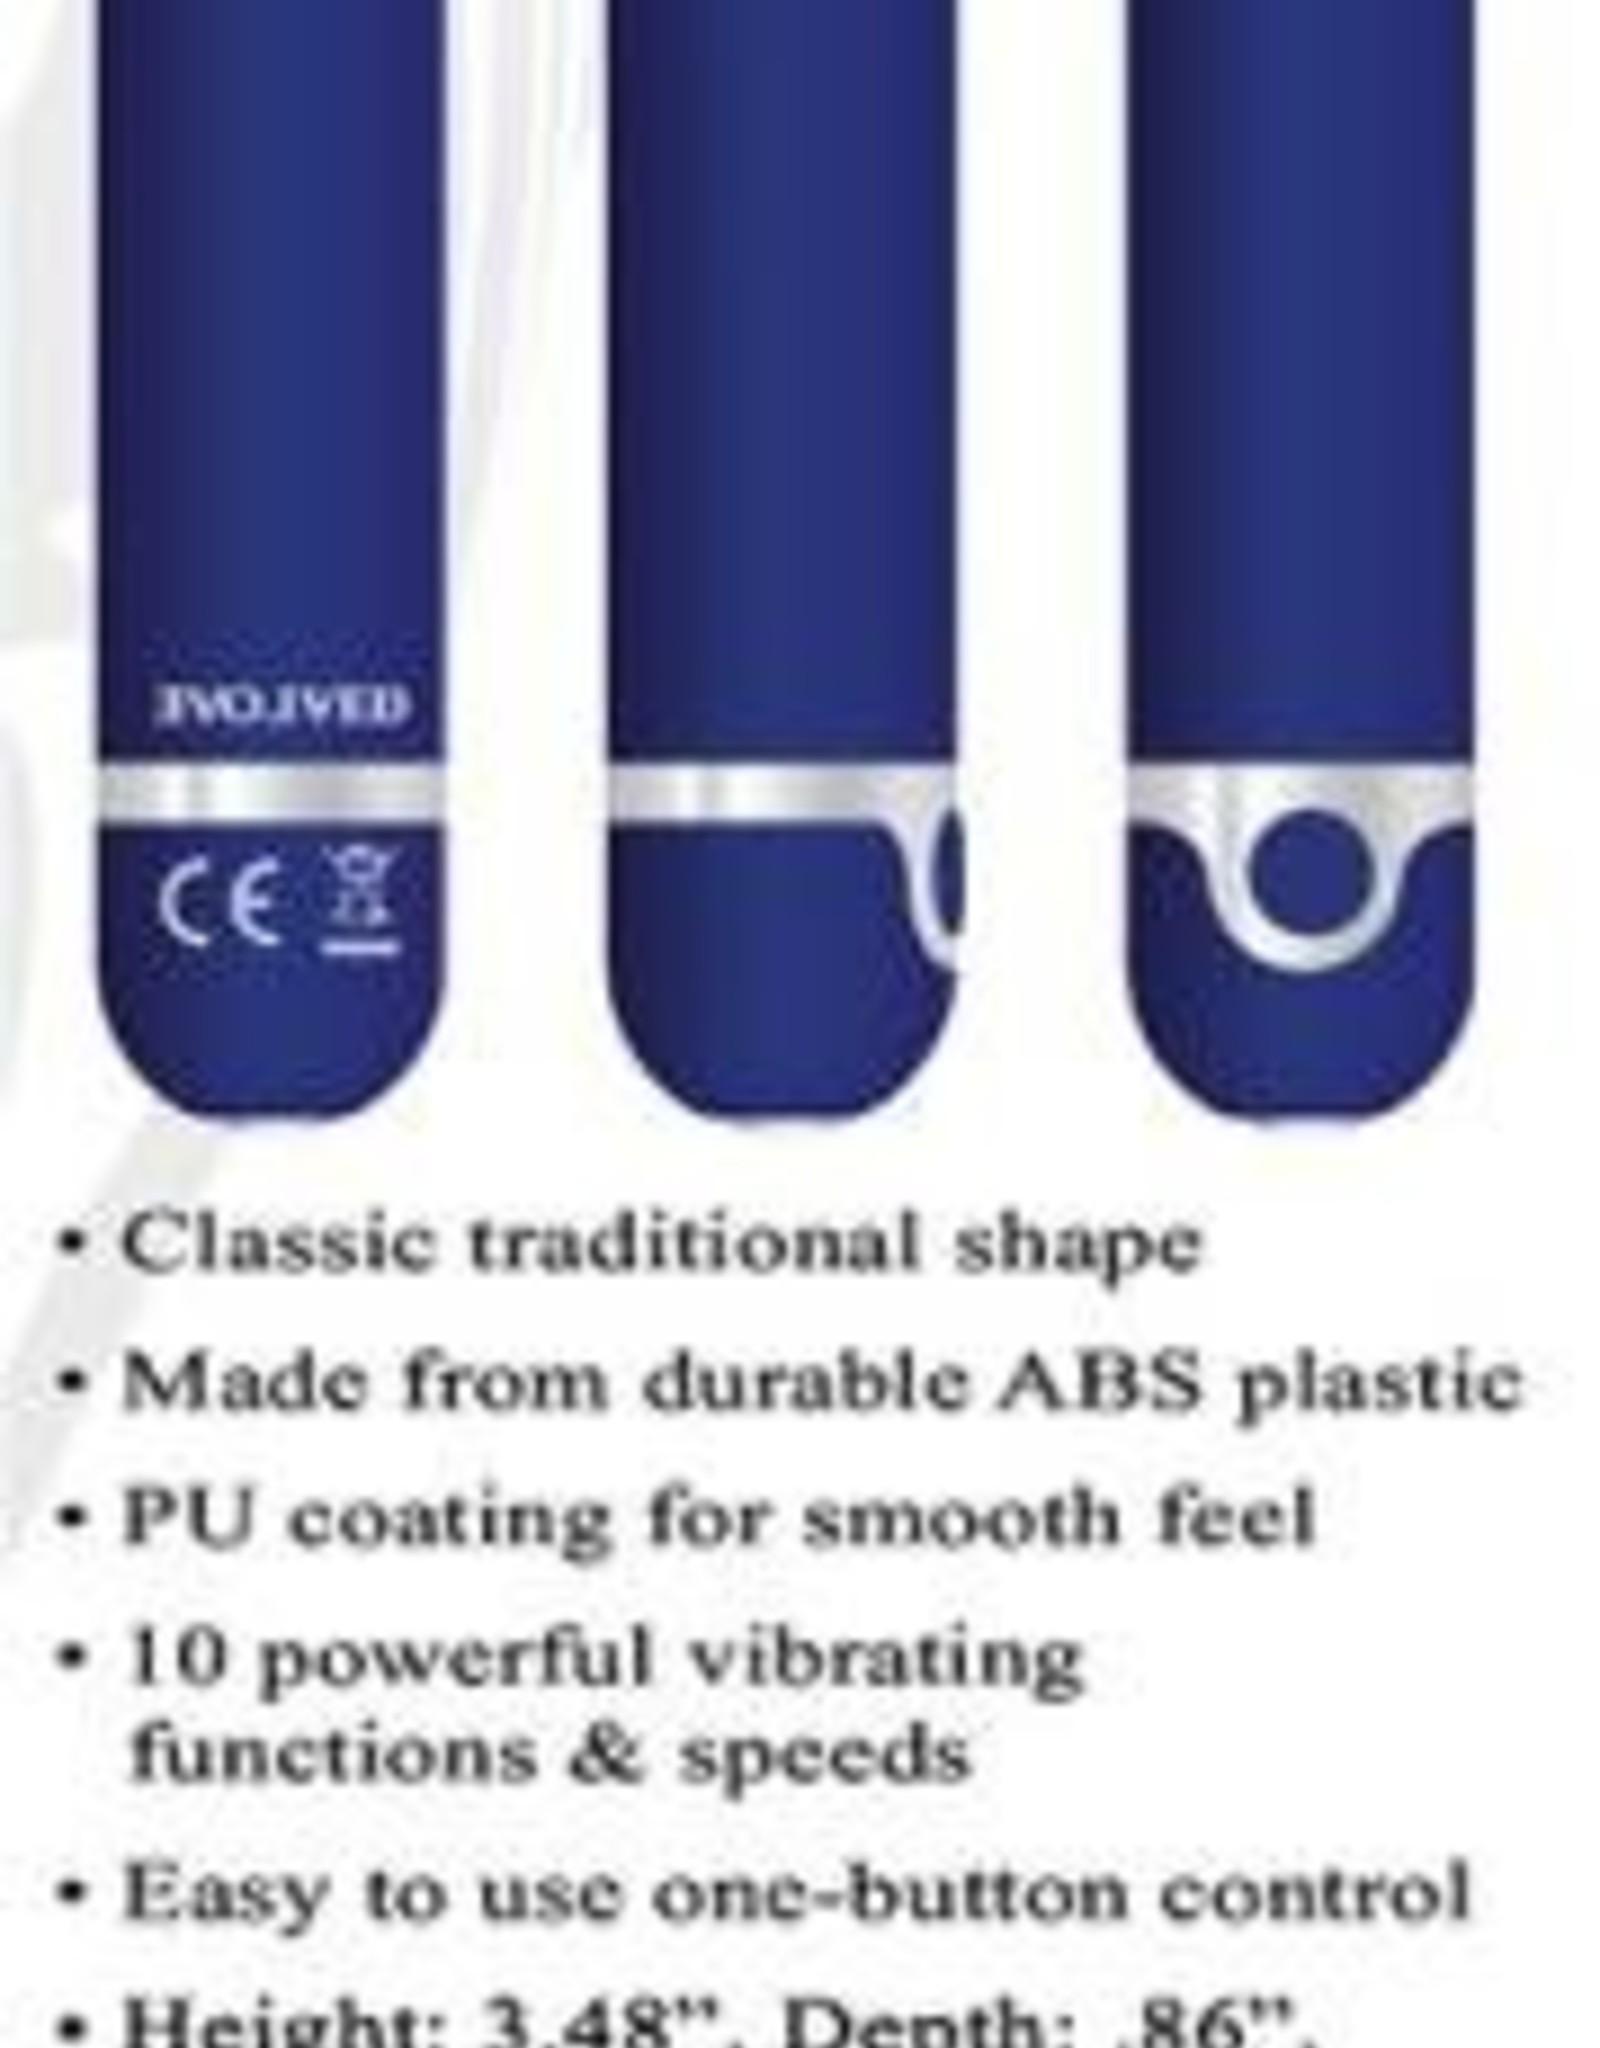 Evolved My Blue Heaven Rechargeable Bullet Vibrator